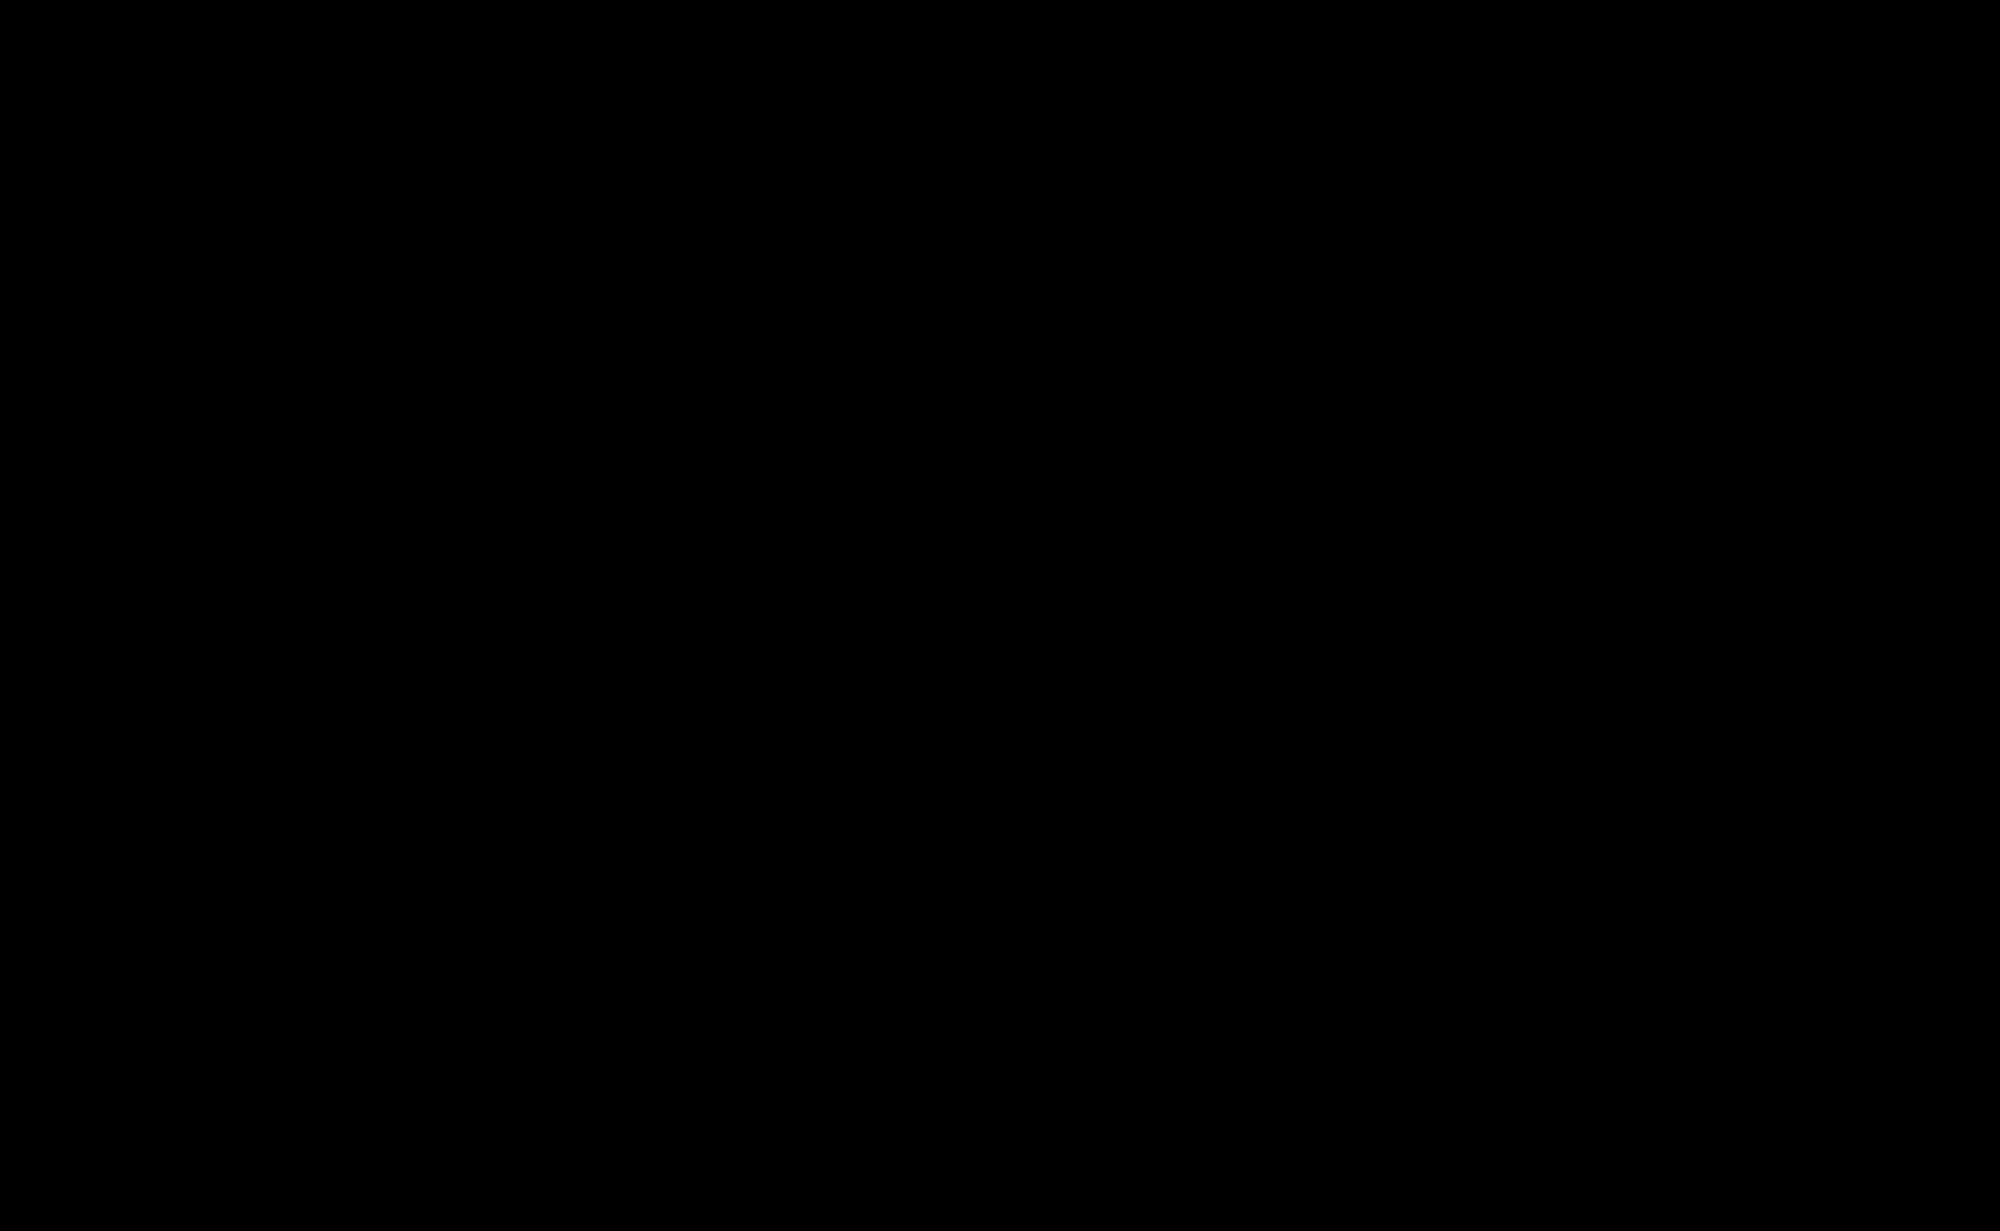 2000px-Converse_logo.jpg